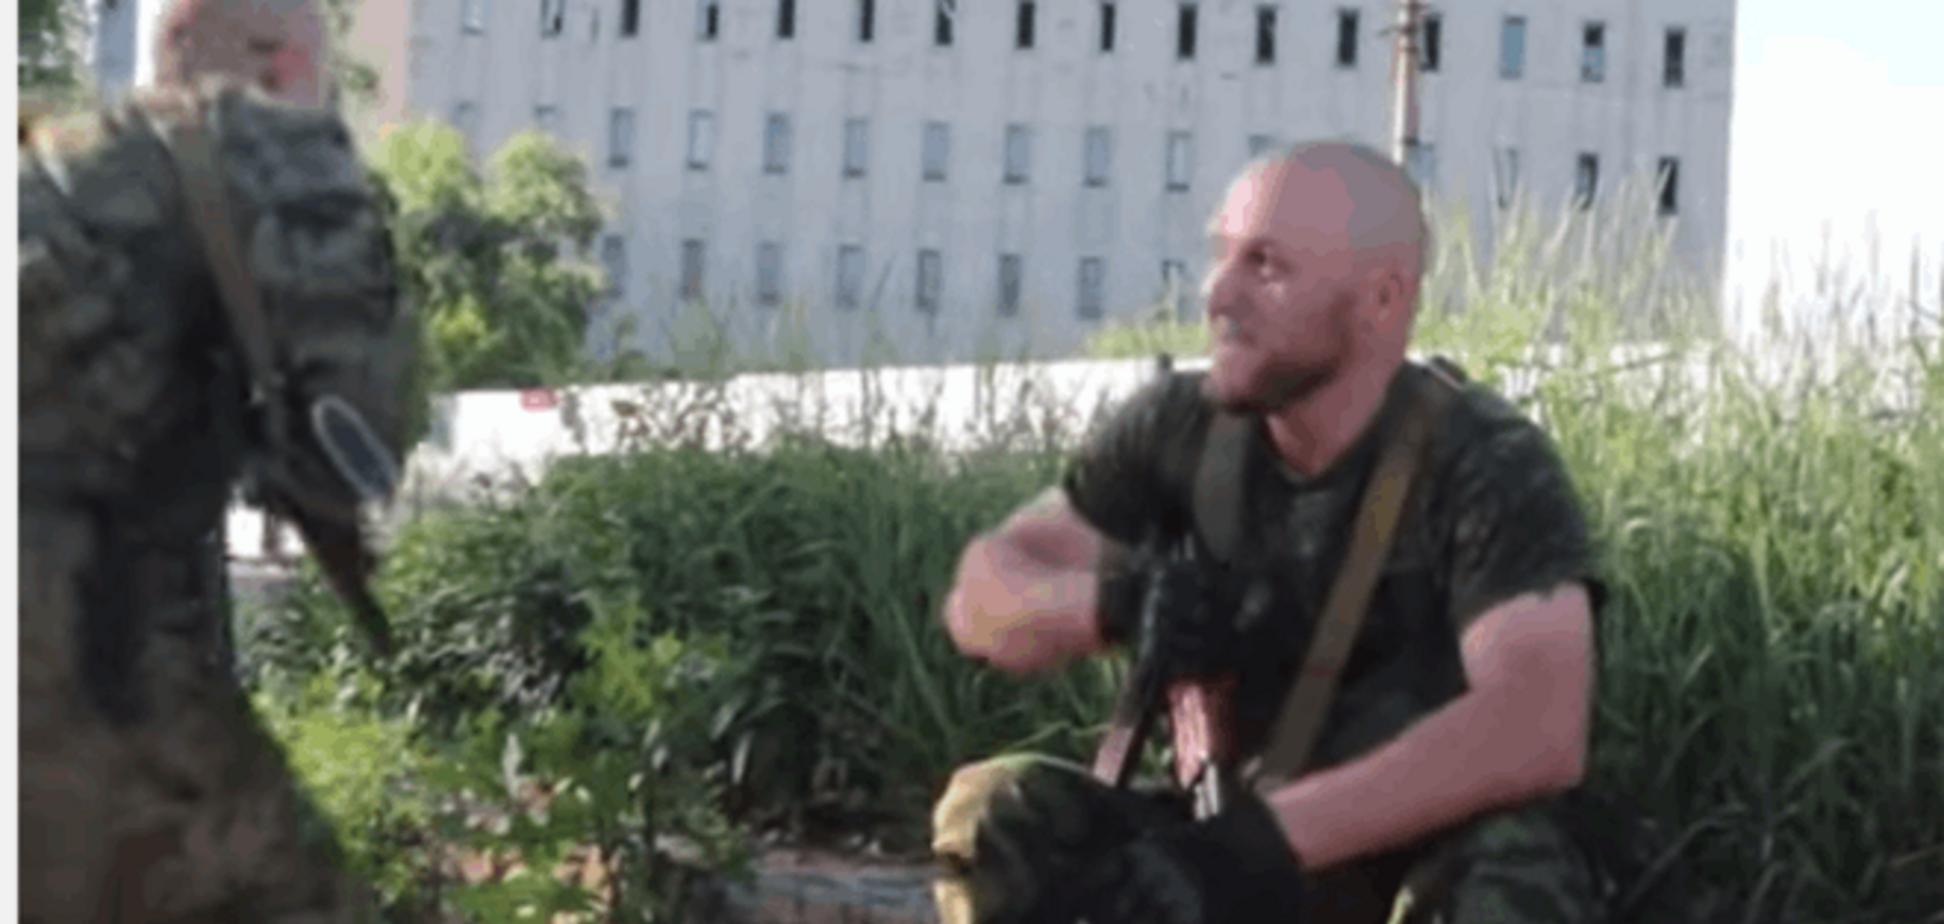 Еле сбежал! Пропагандист Грэм Филлипс попал под обстрел в Донецке: видеофакт